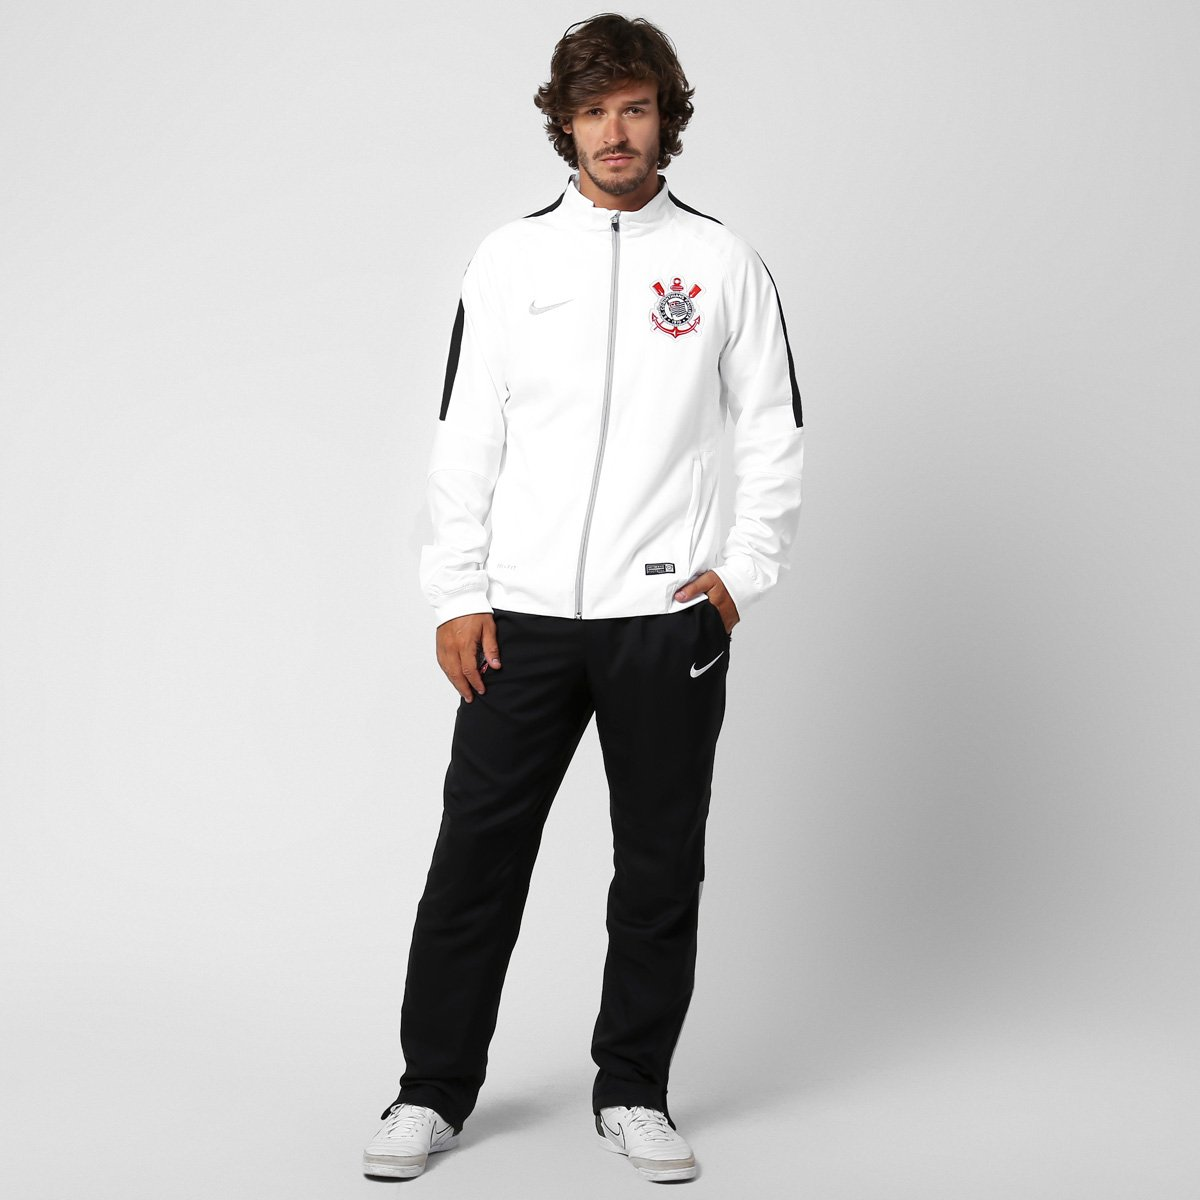 cbacbdbb4e Agasalho Nike Corinthians Squad Sideline Woven - Compre Agora